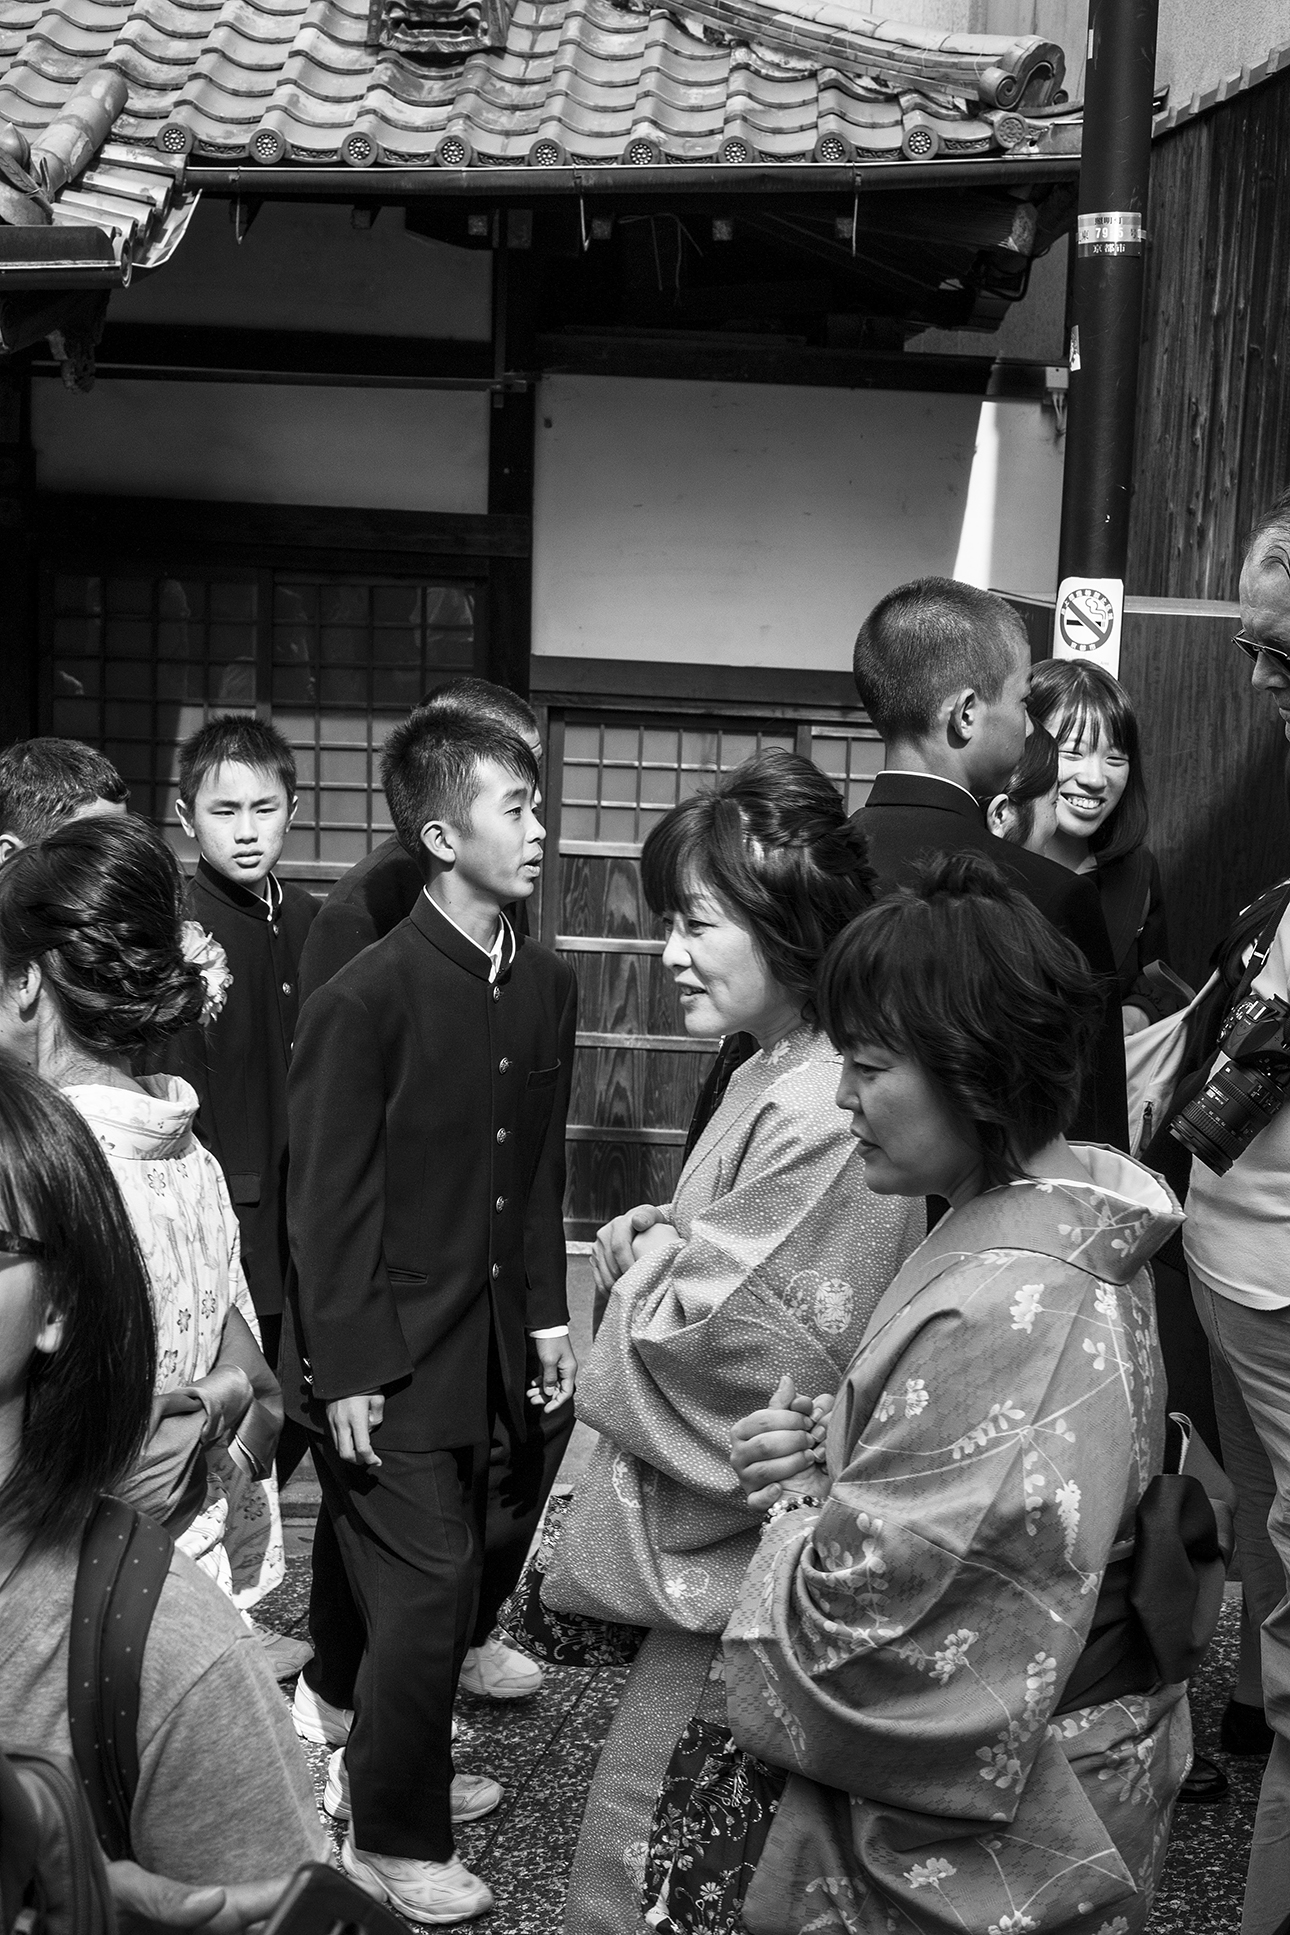 foule-Kyoto-Japon-octobre-2016.jpg